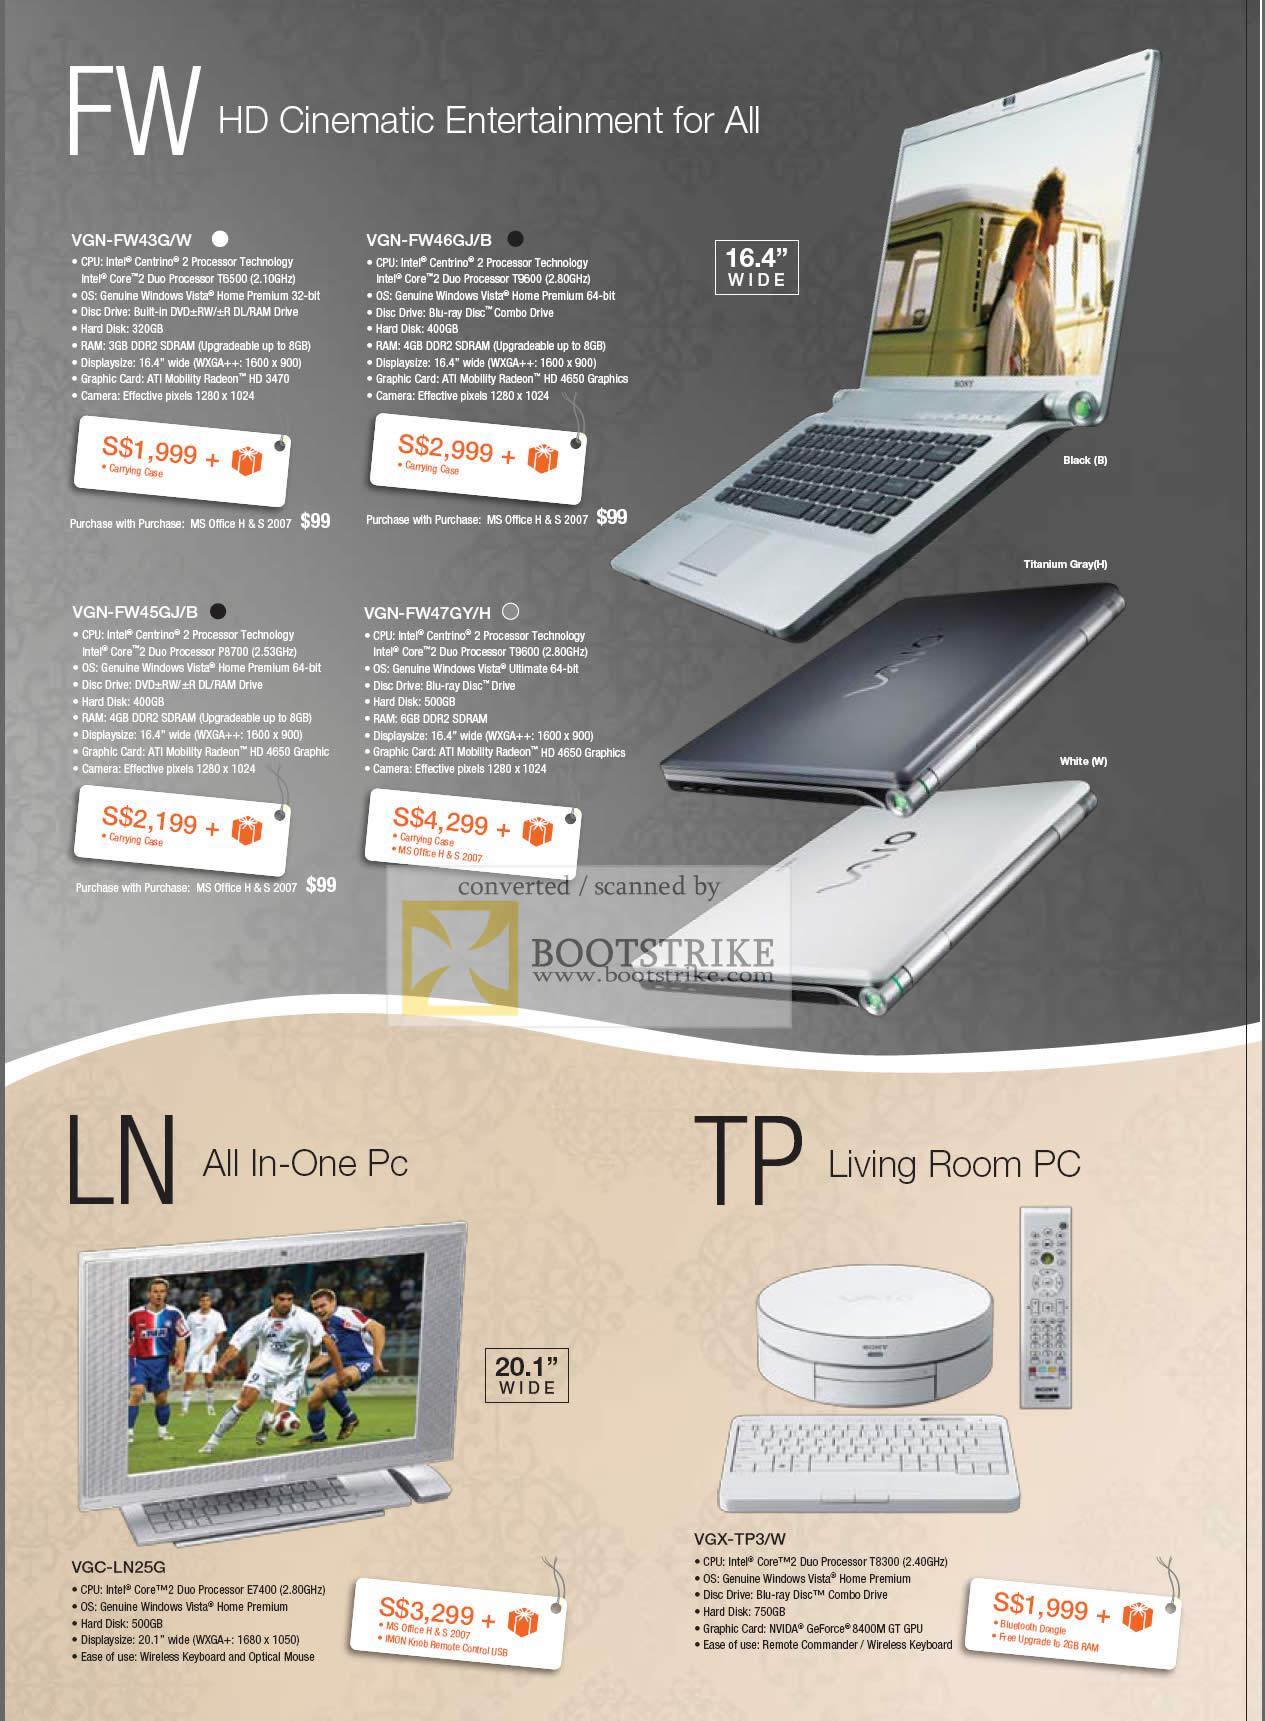 Comex 2009 price list image brochure of Sony Vaio FW VGN FW43G FW46GJ FW45GJ FW47GY LN PC VGC-LN25G TP VGX-TP3